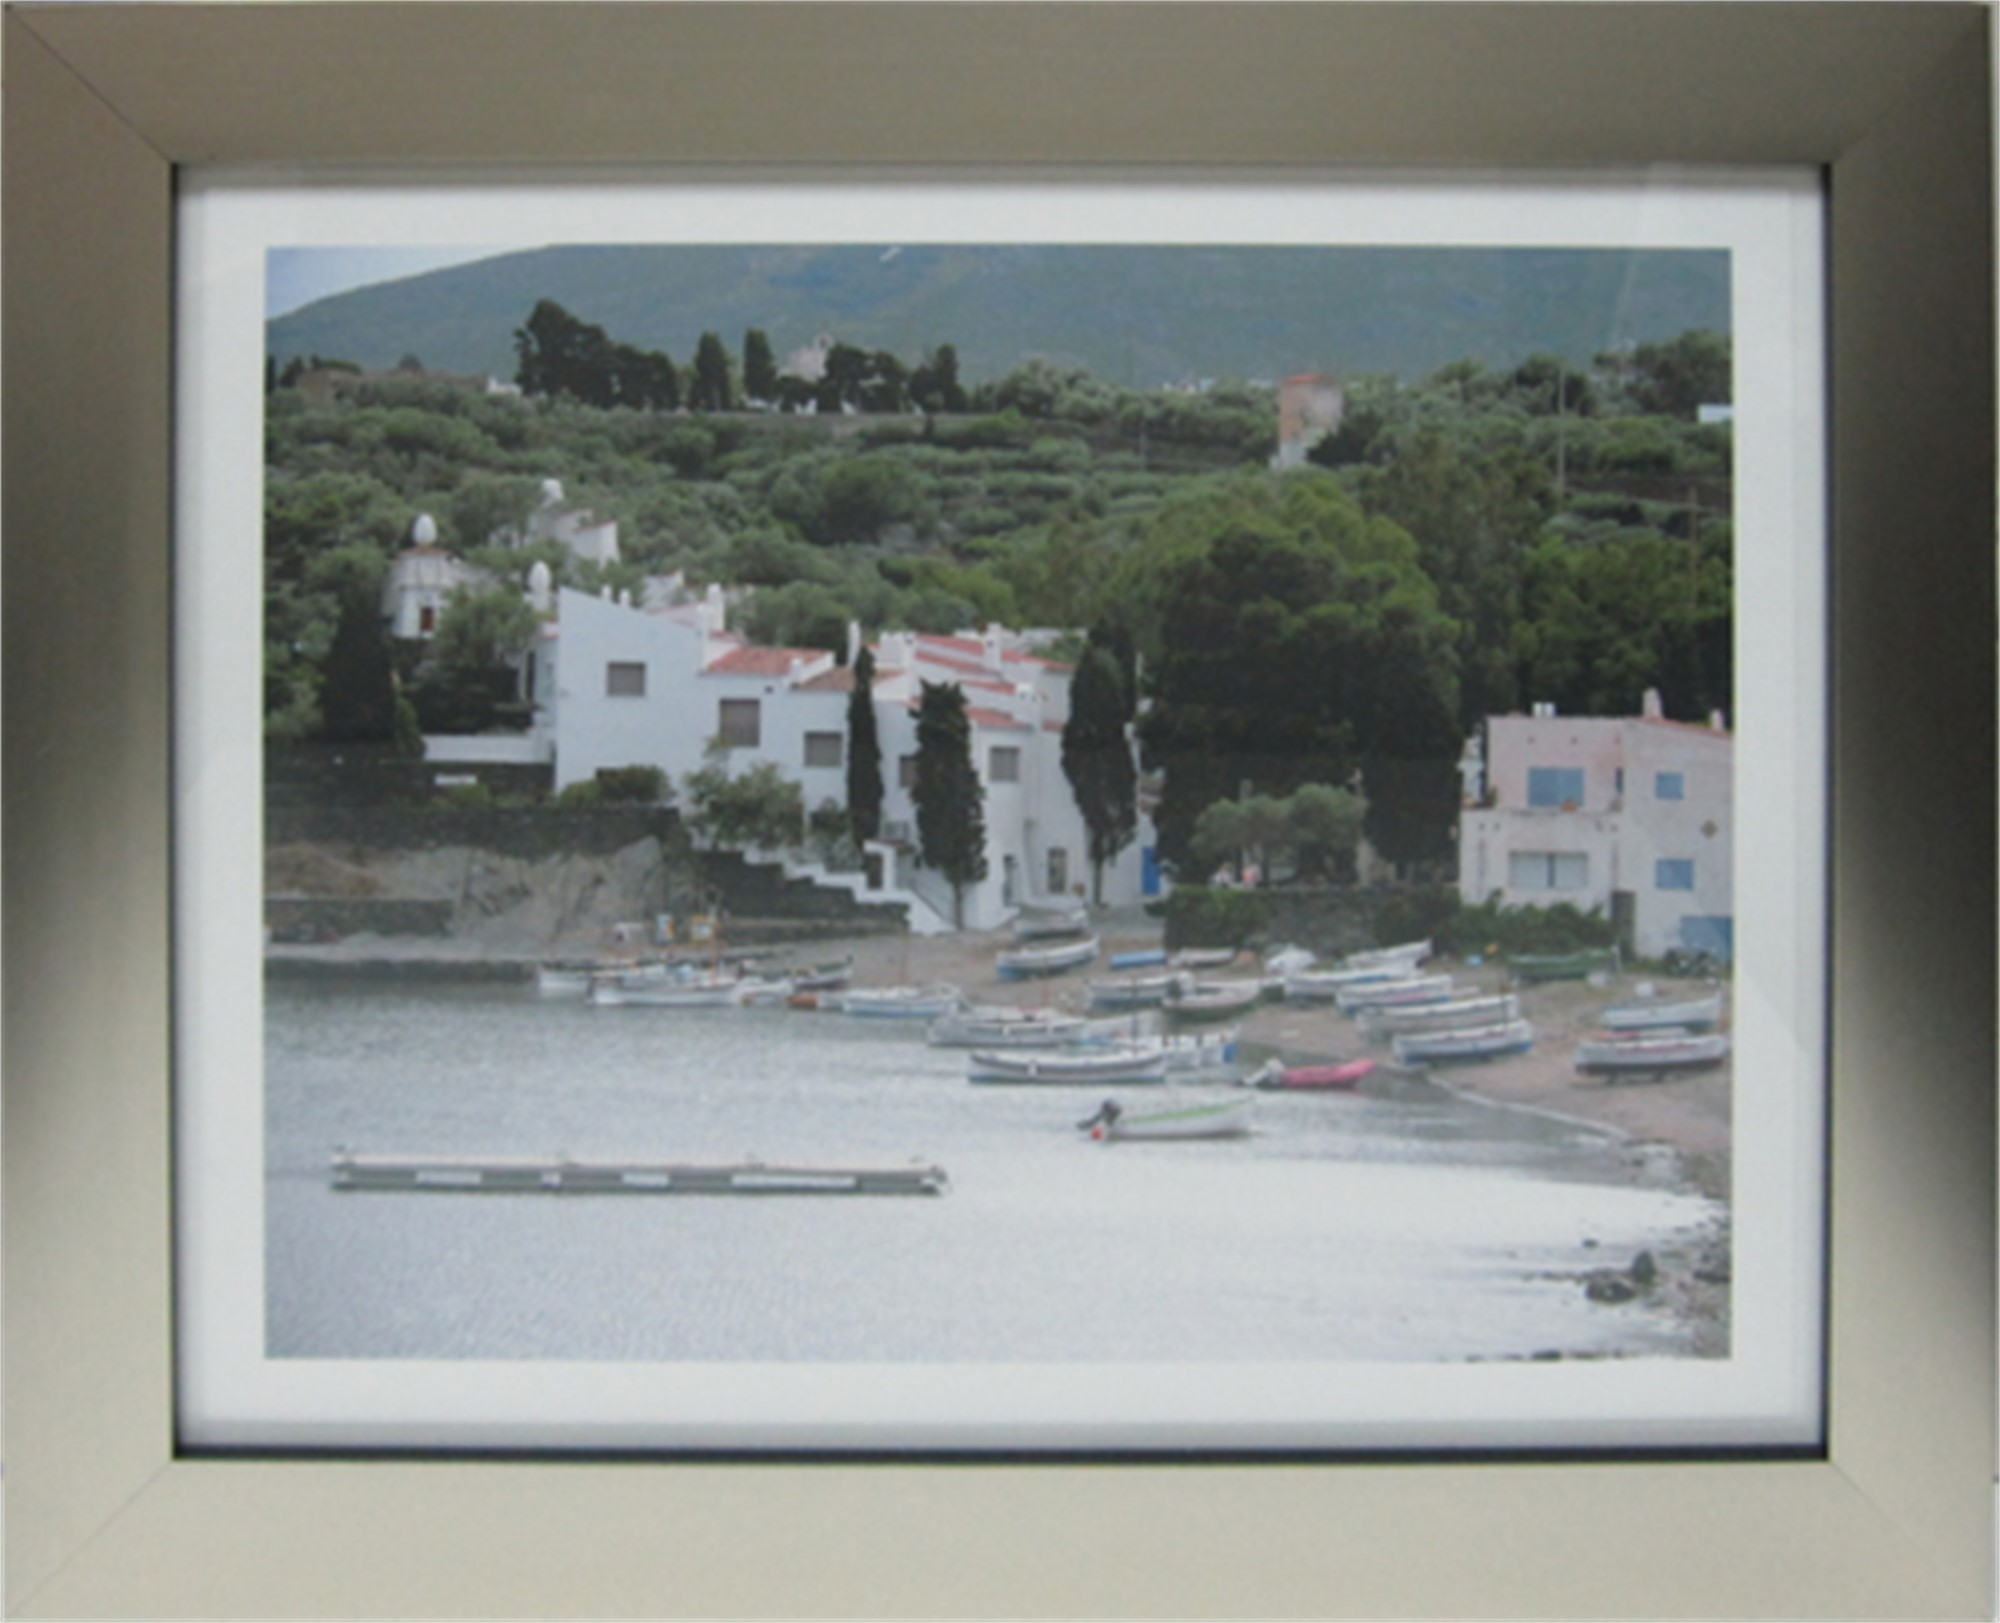 Salvador Dali's Home in Port Lligat, Spain by L. C. Kopczyk